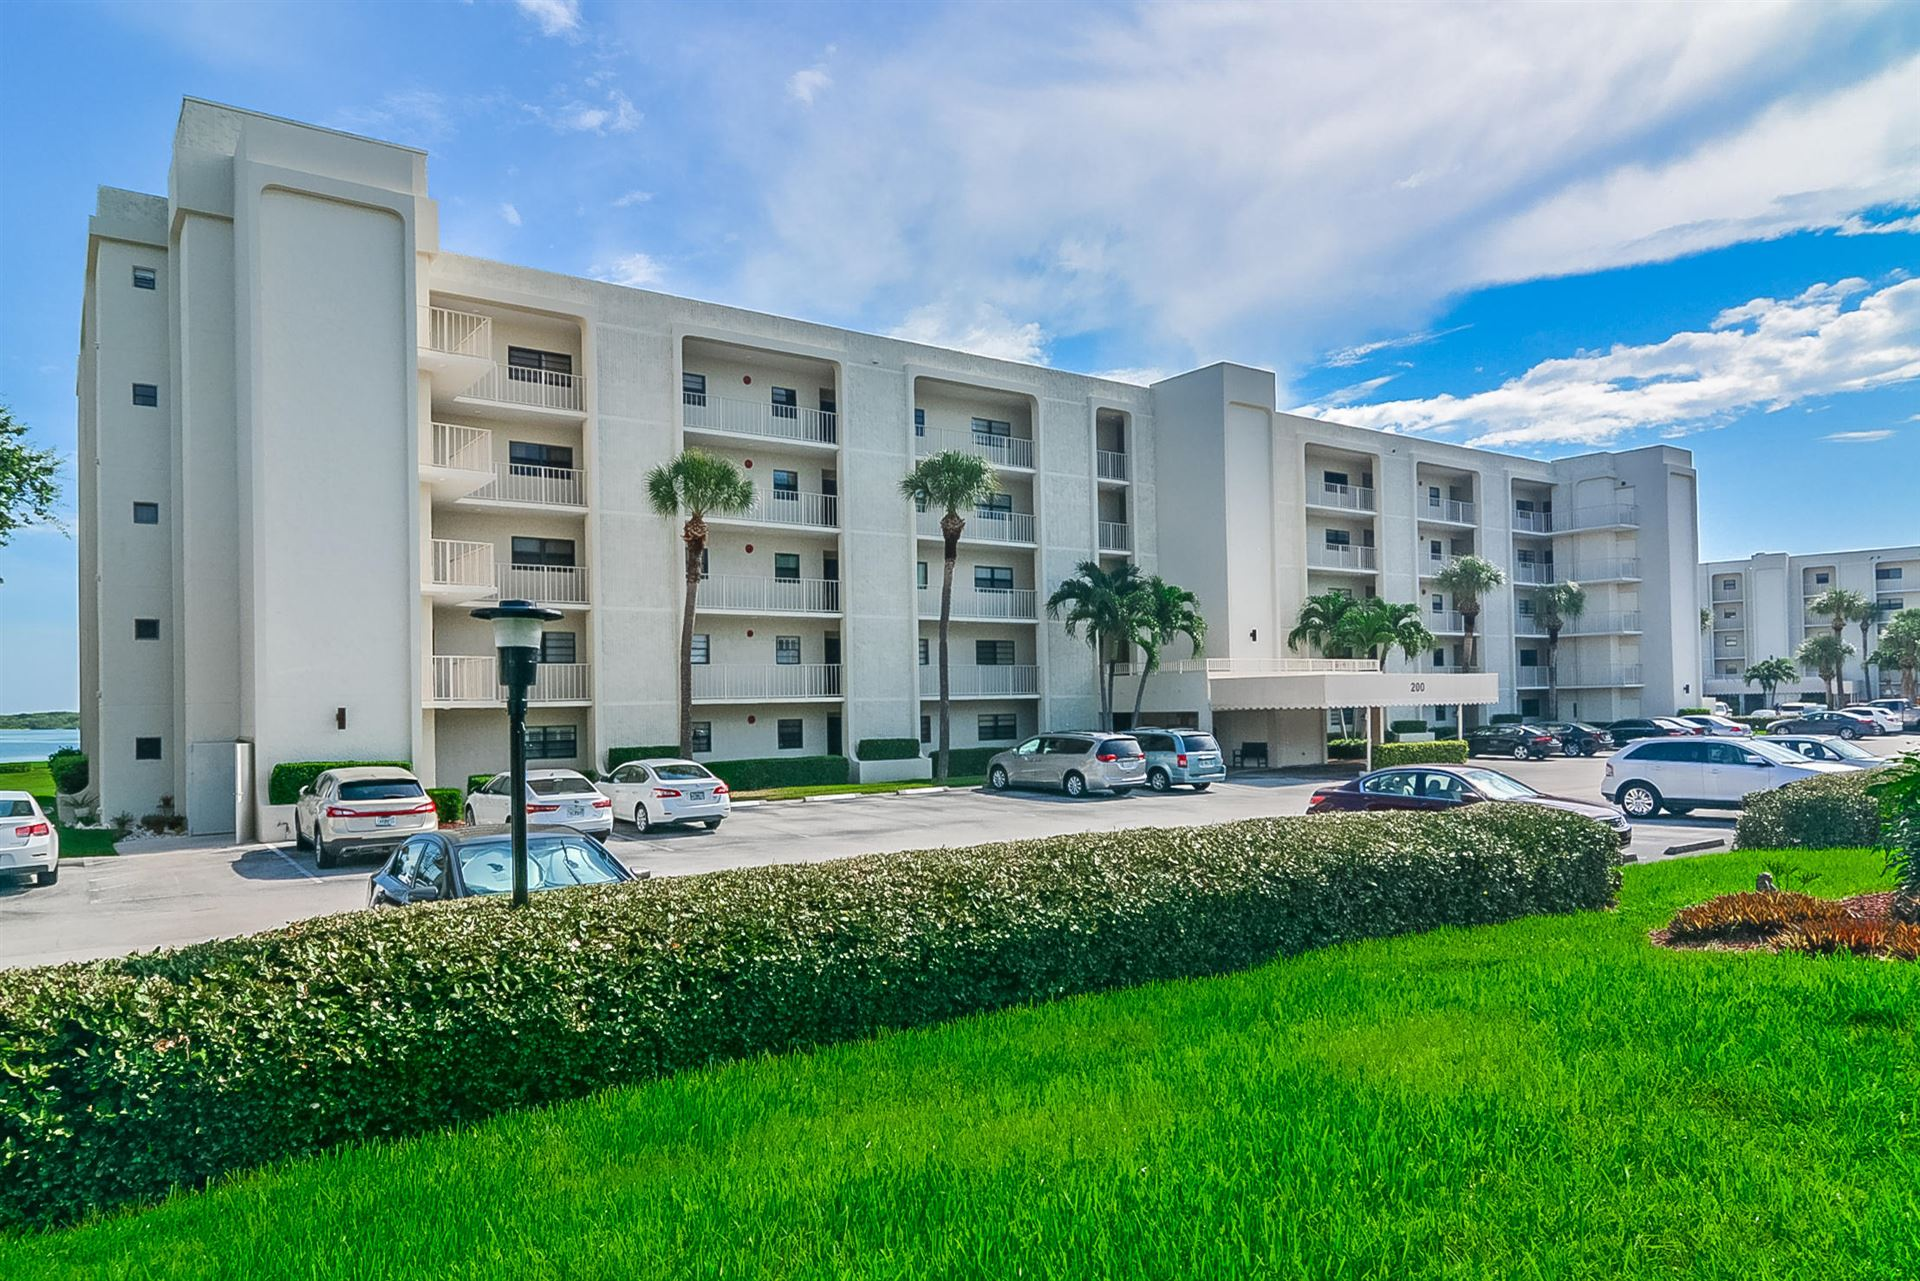 Photo of 200 Intracoastal Place #403, Tequesta, FL 33469 (MLS # RX-10656551)